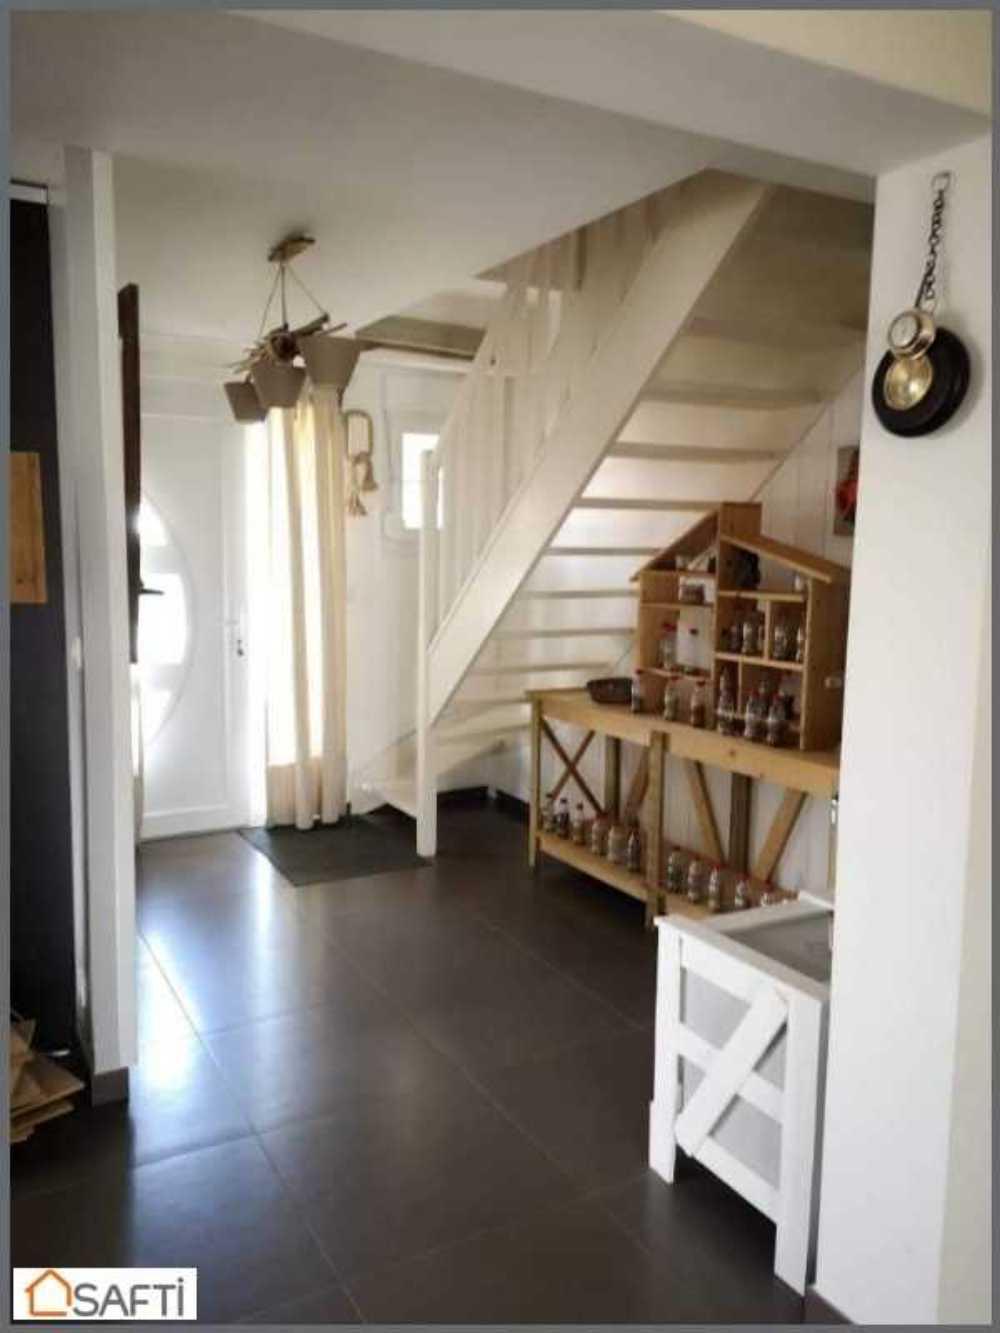 Rang-du-Fliers Pas-de-Calais Haus Bild 4072679